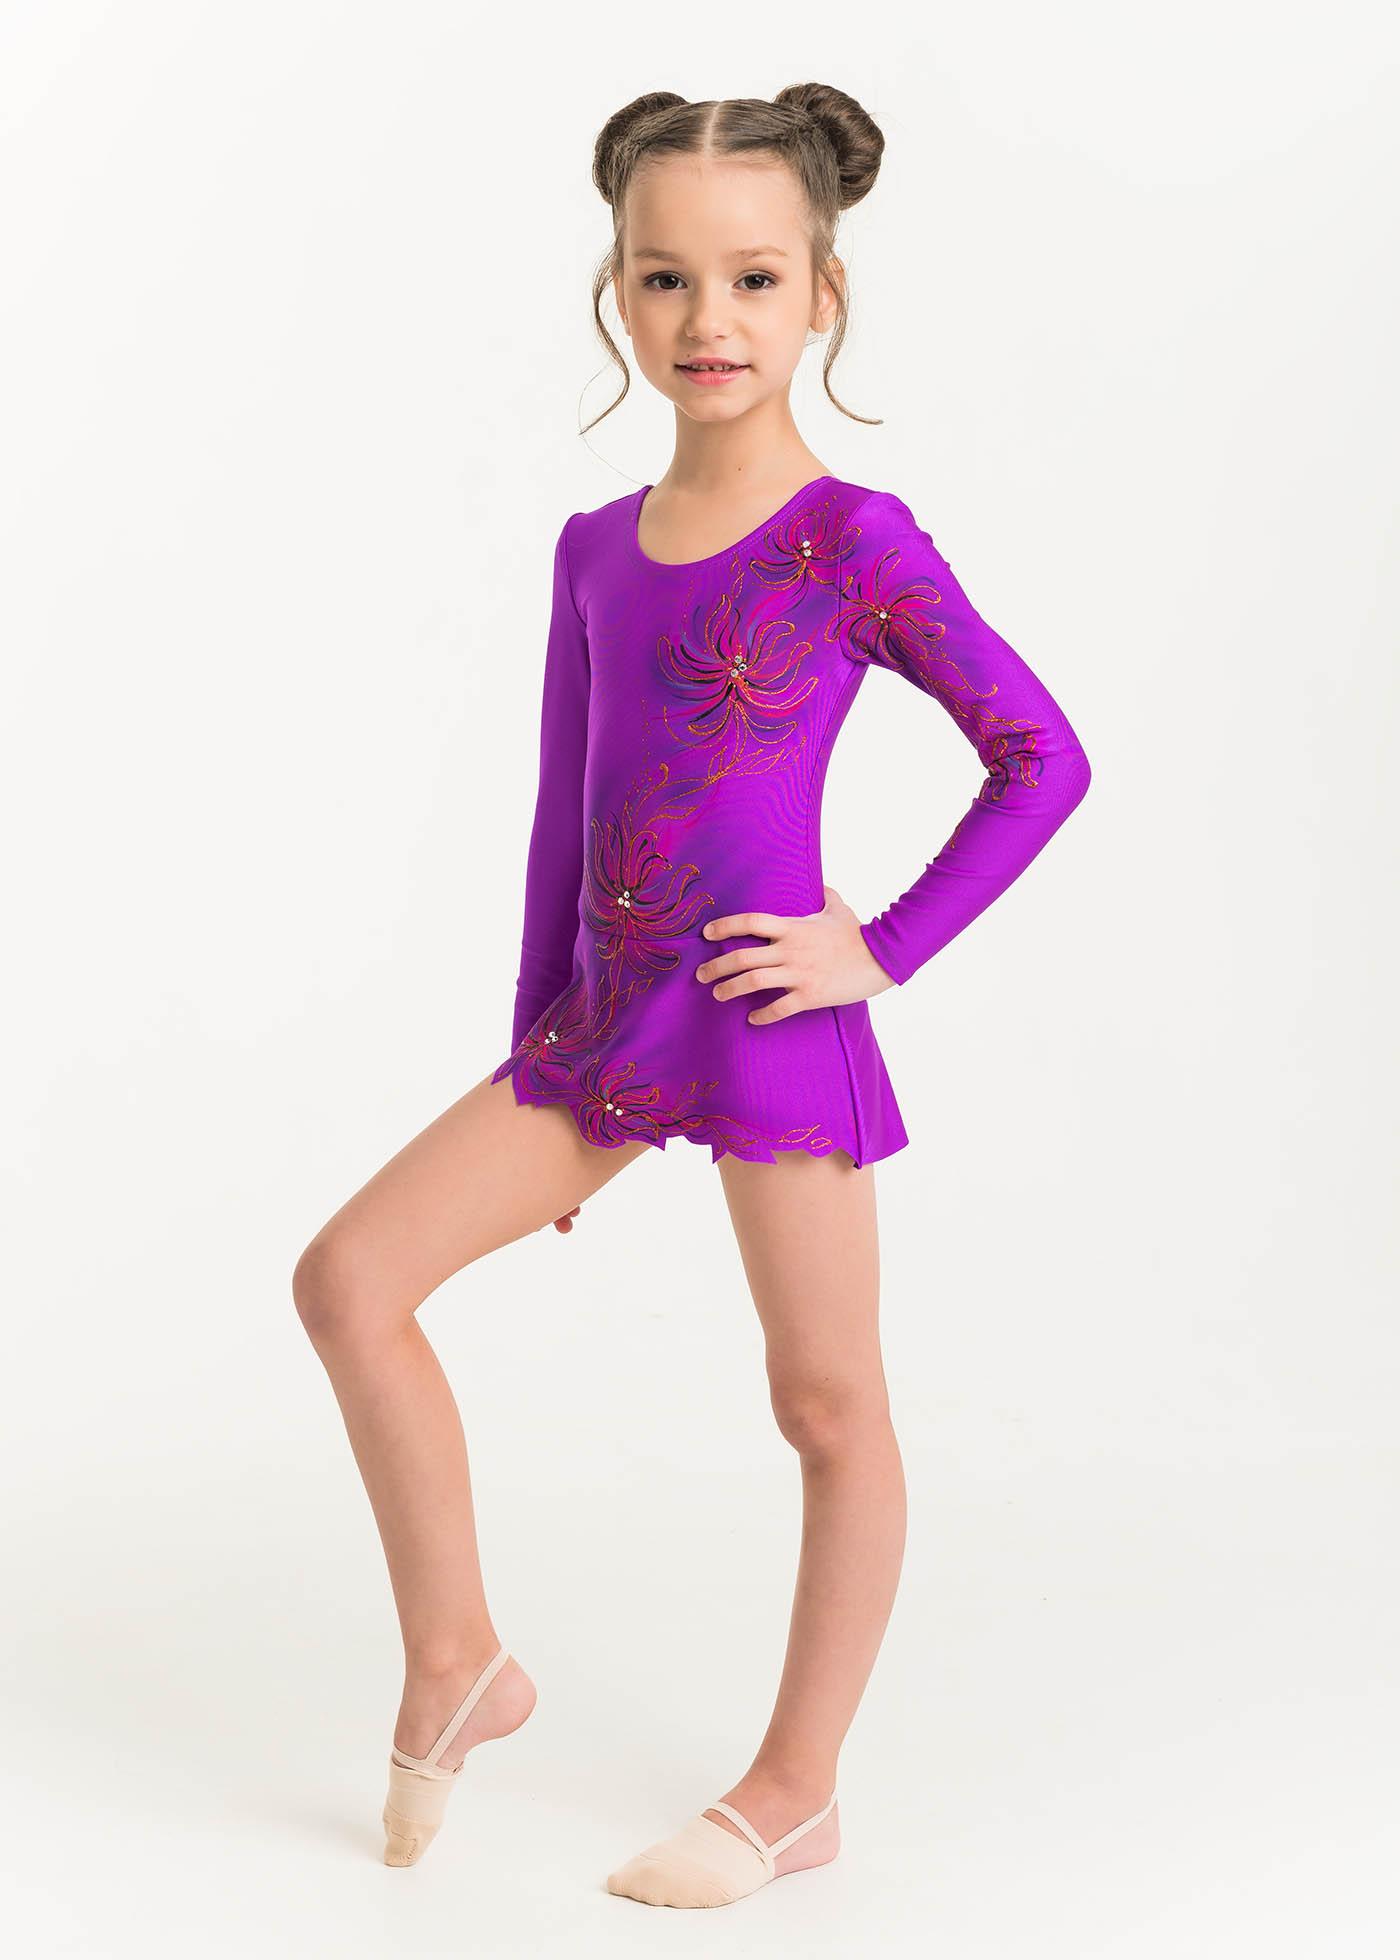 Rhythmic gymnastics, Ava, pic 2